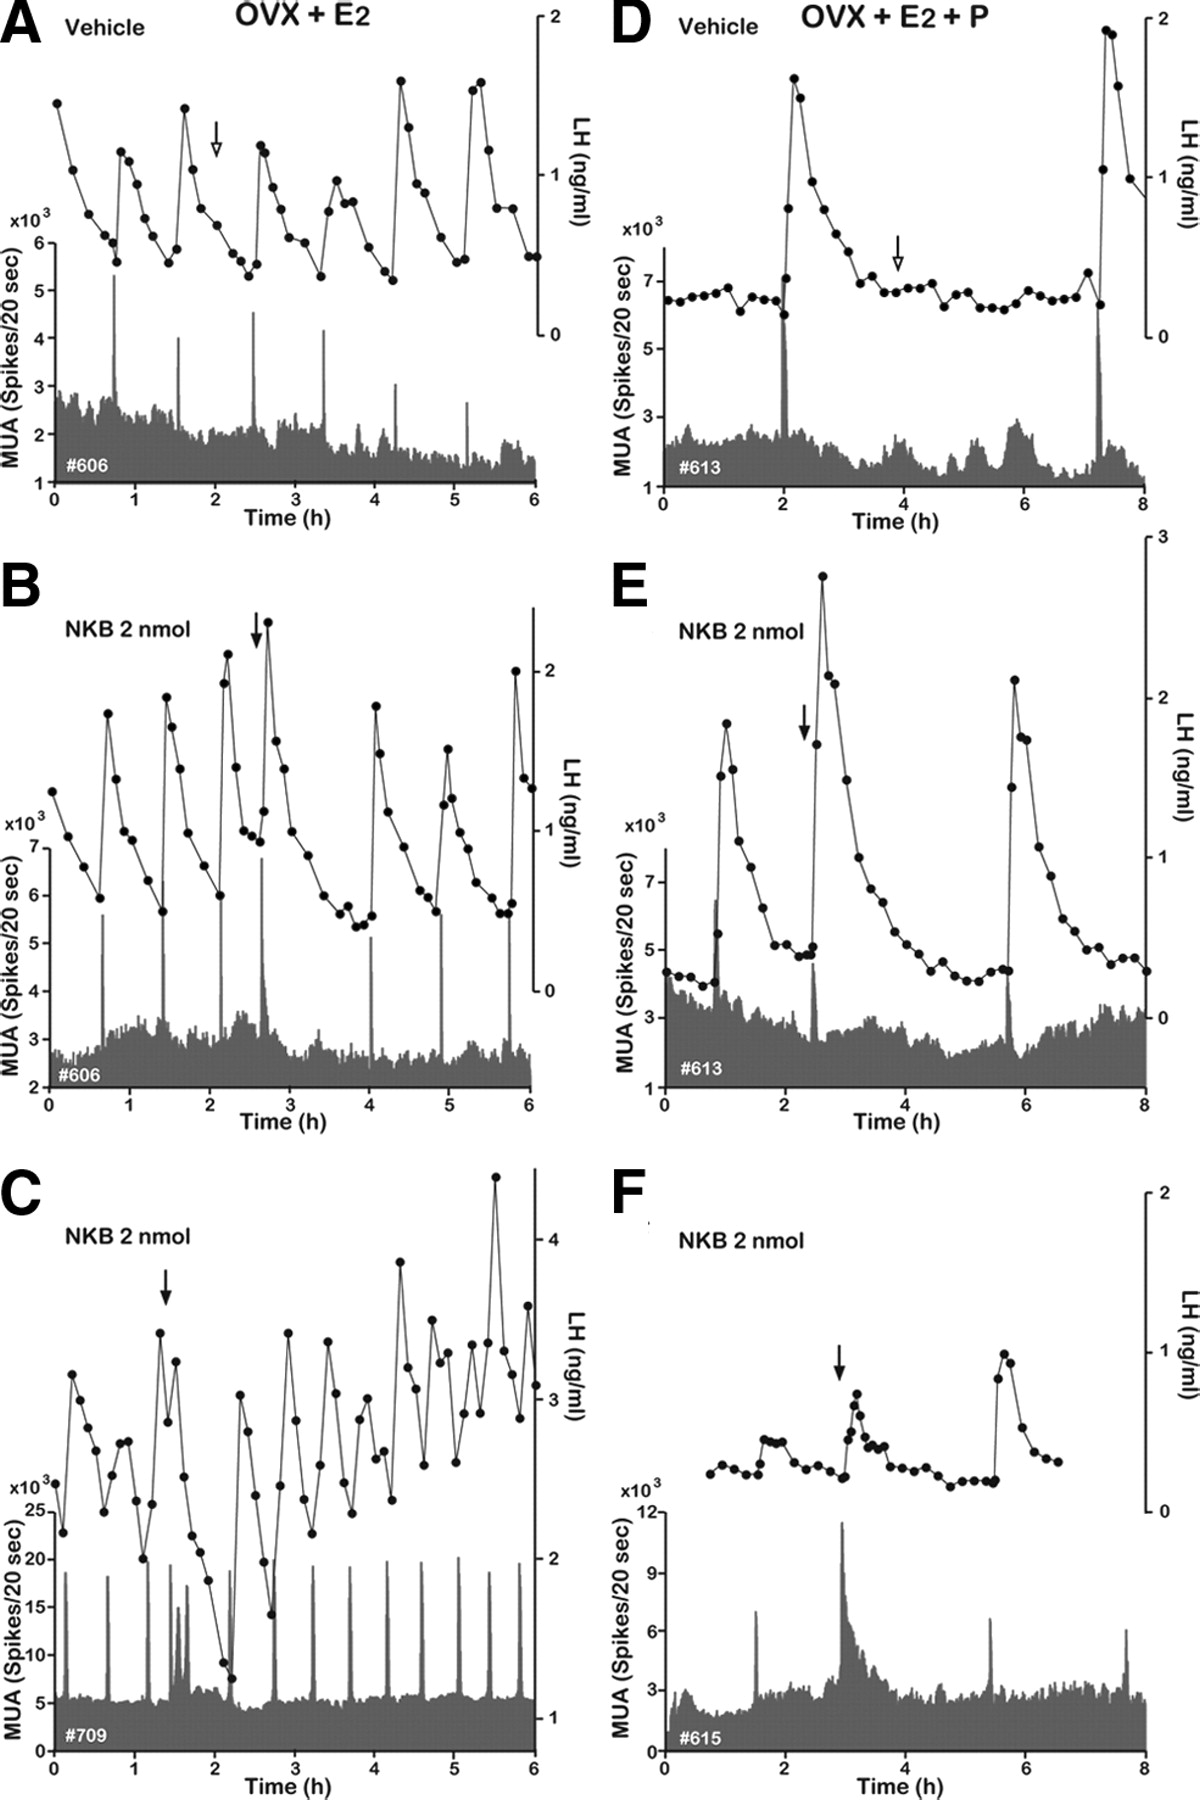 Neurokinin B and Dynorphin A in Kisspeptin Neurons of the